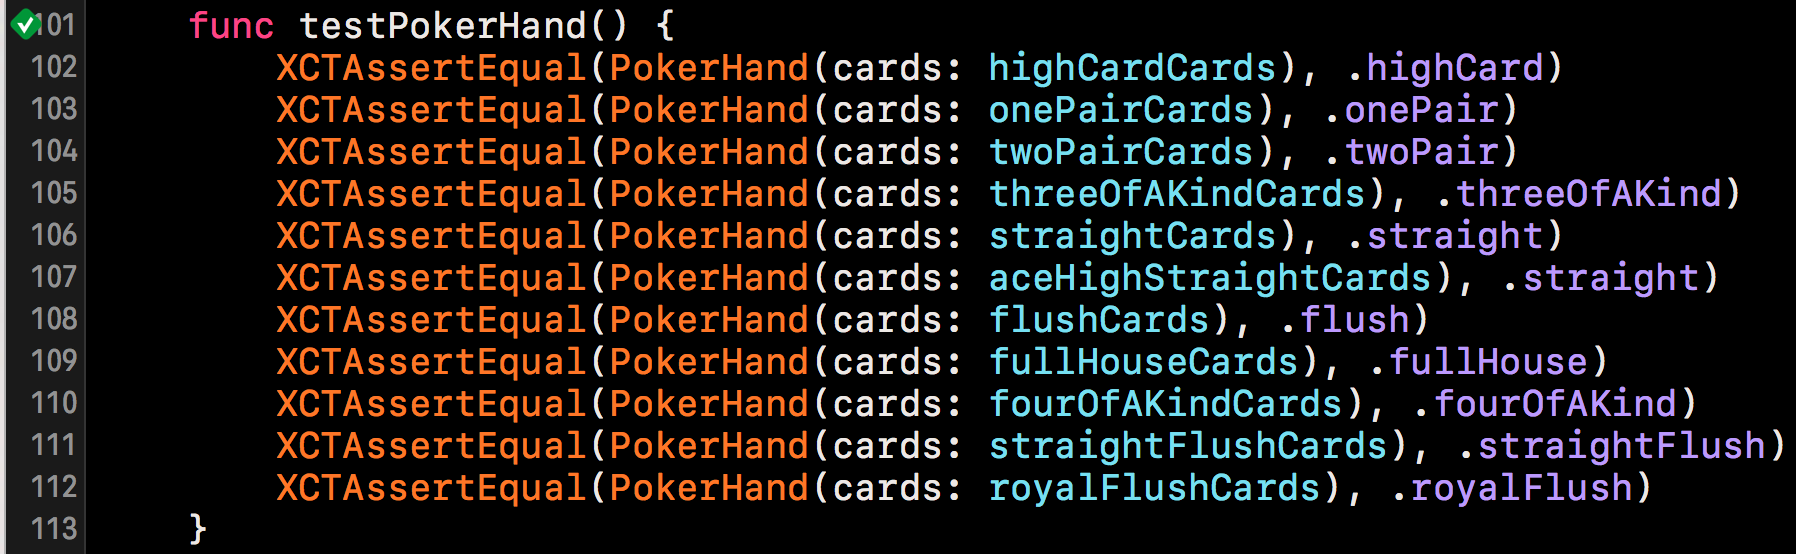 PokerHandテスト結果.png